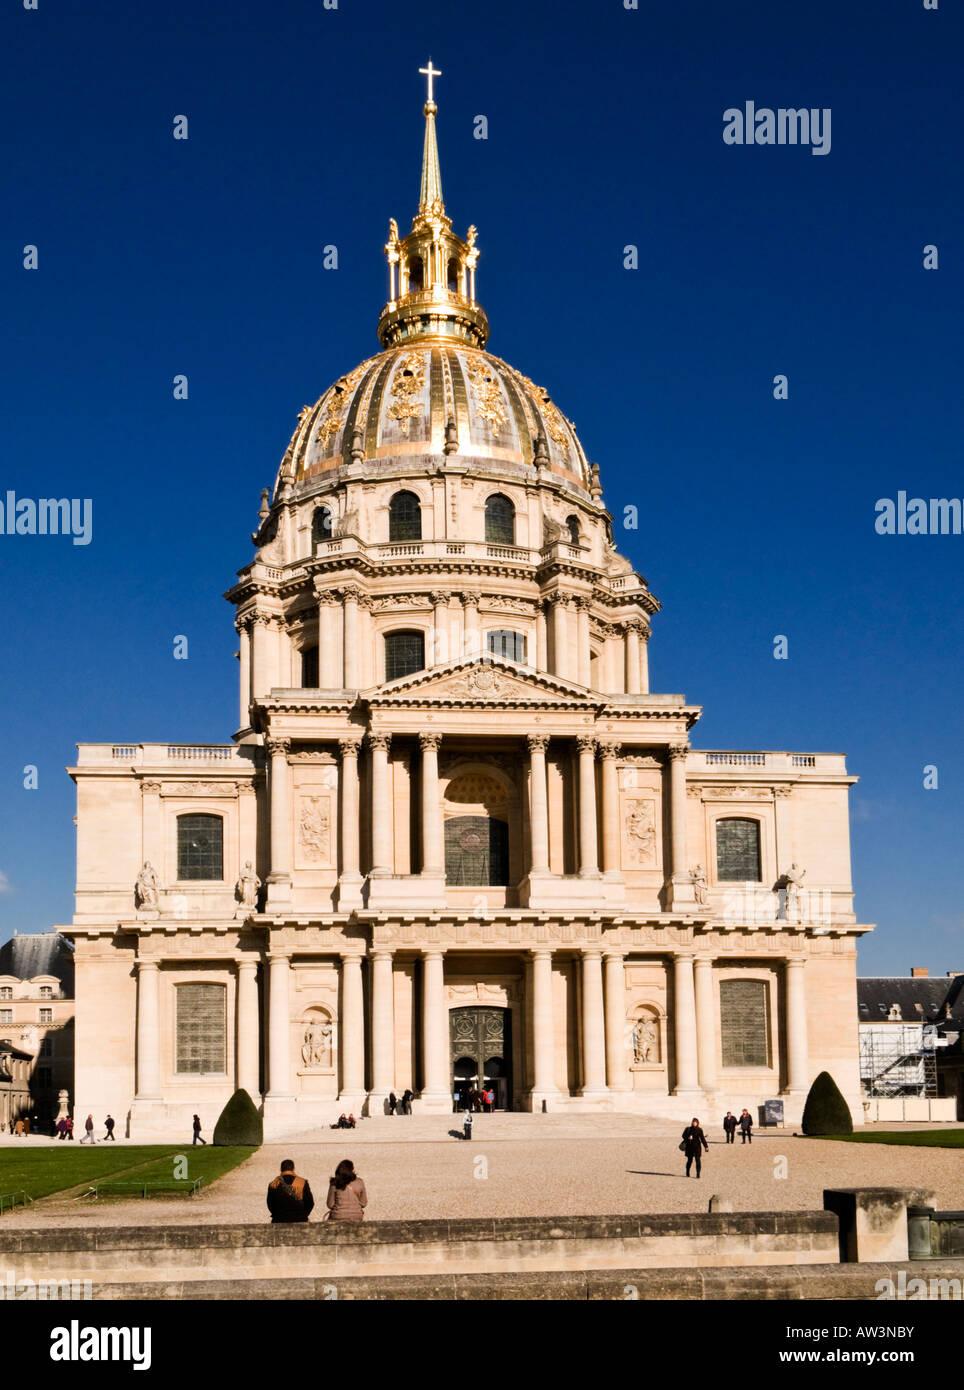 Les Invalides, Paris, France, Europe - Stock Image